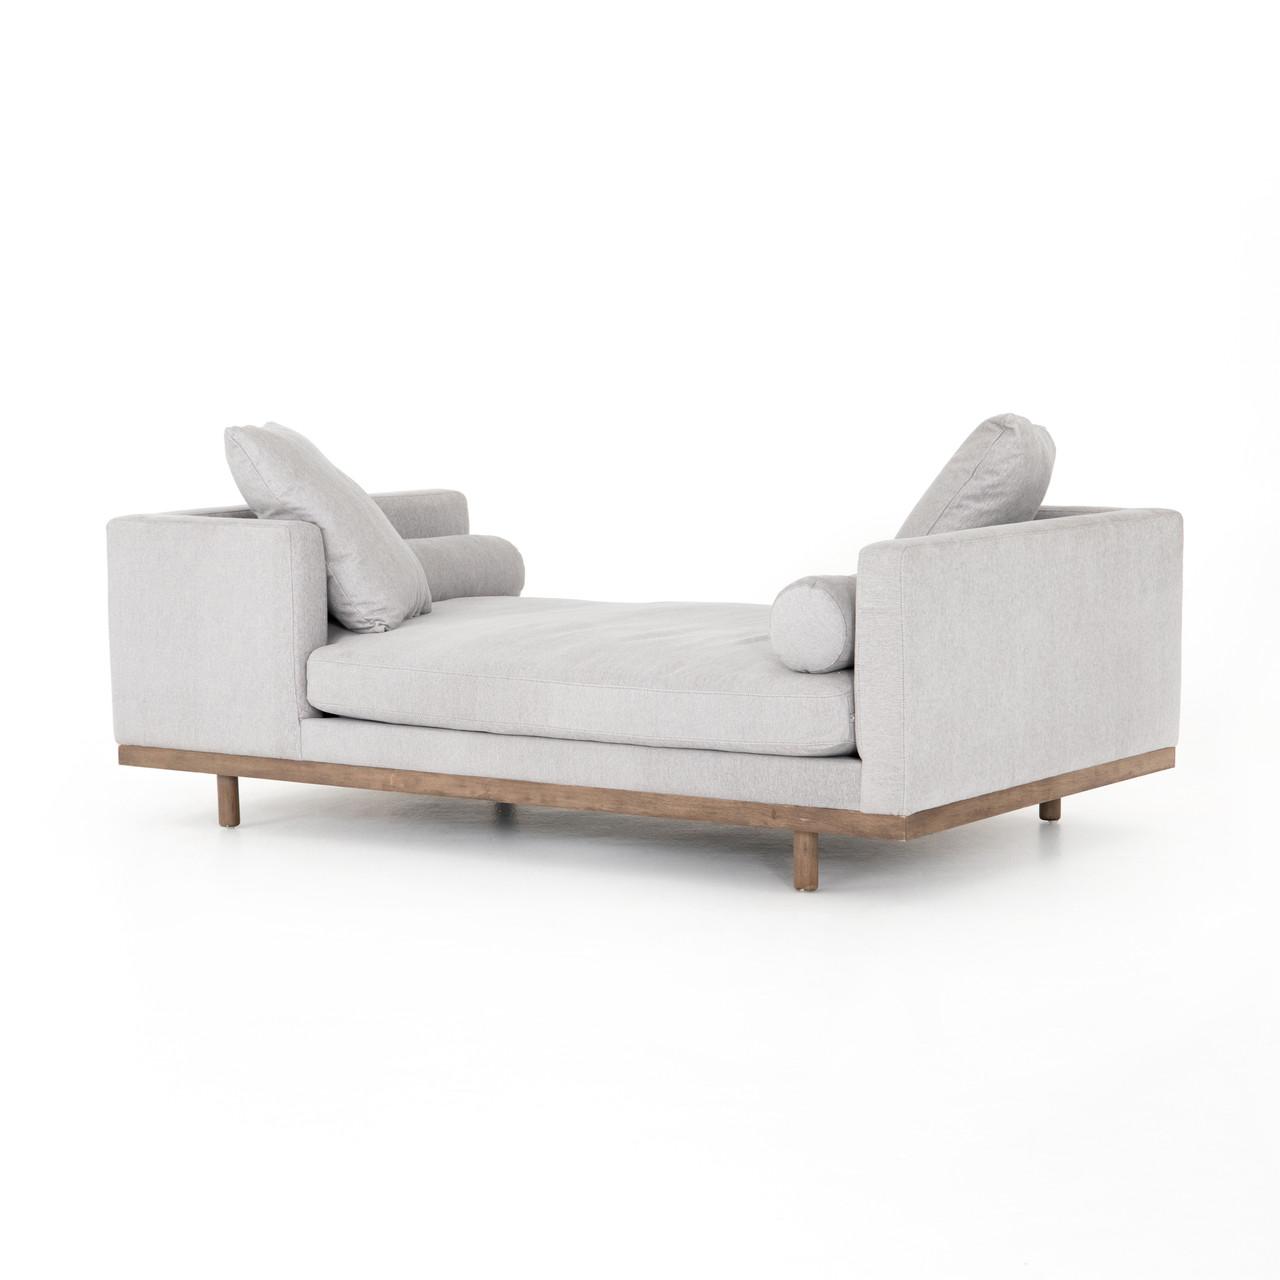 - Brady Tete A Tete Light Grey Double Chaise Lounge 85